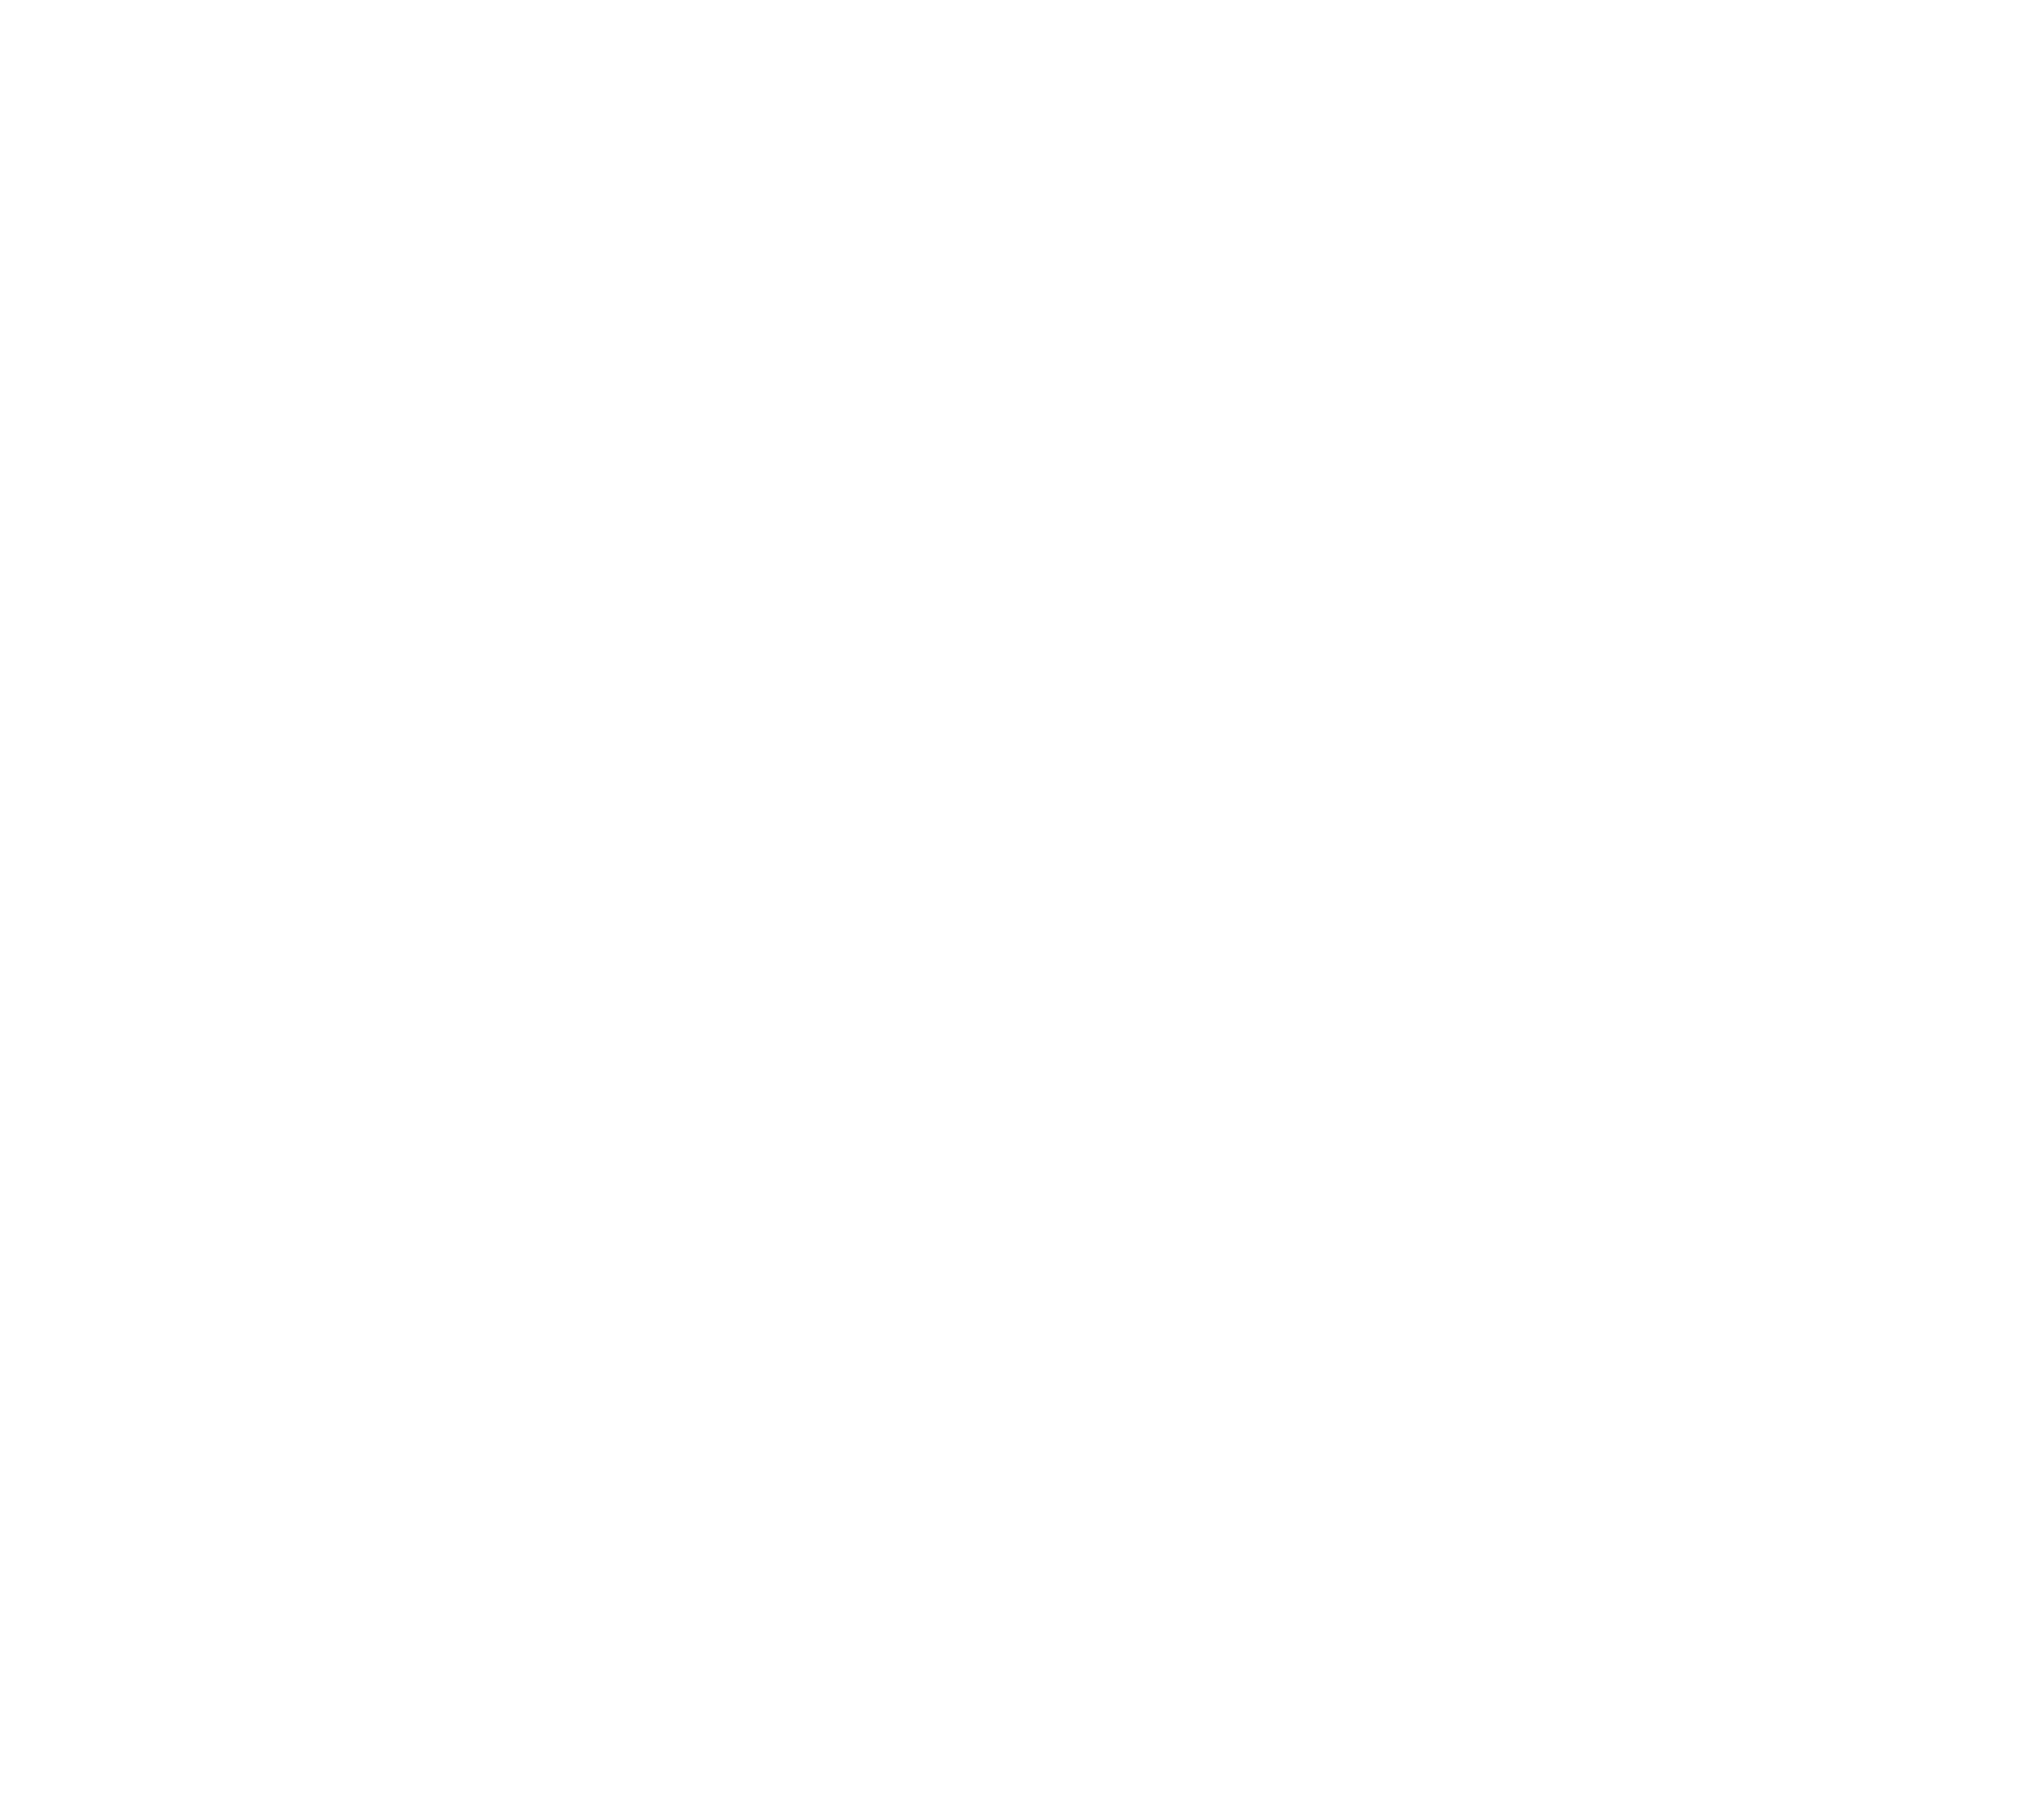 schema lapte enona_transp-03